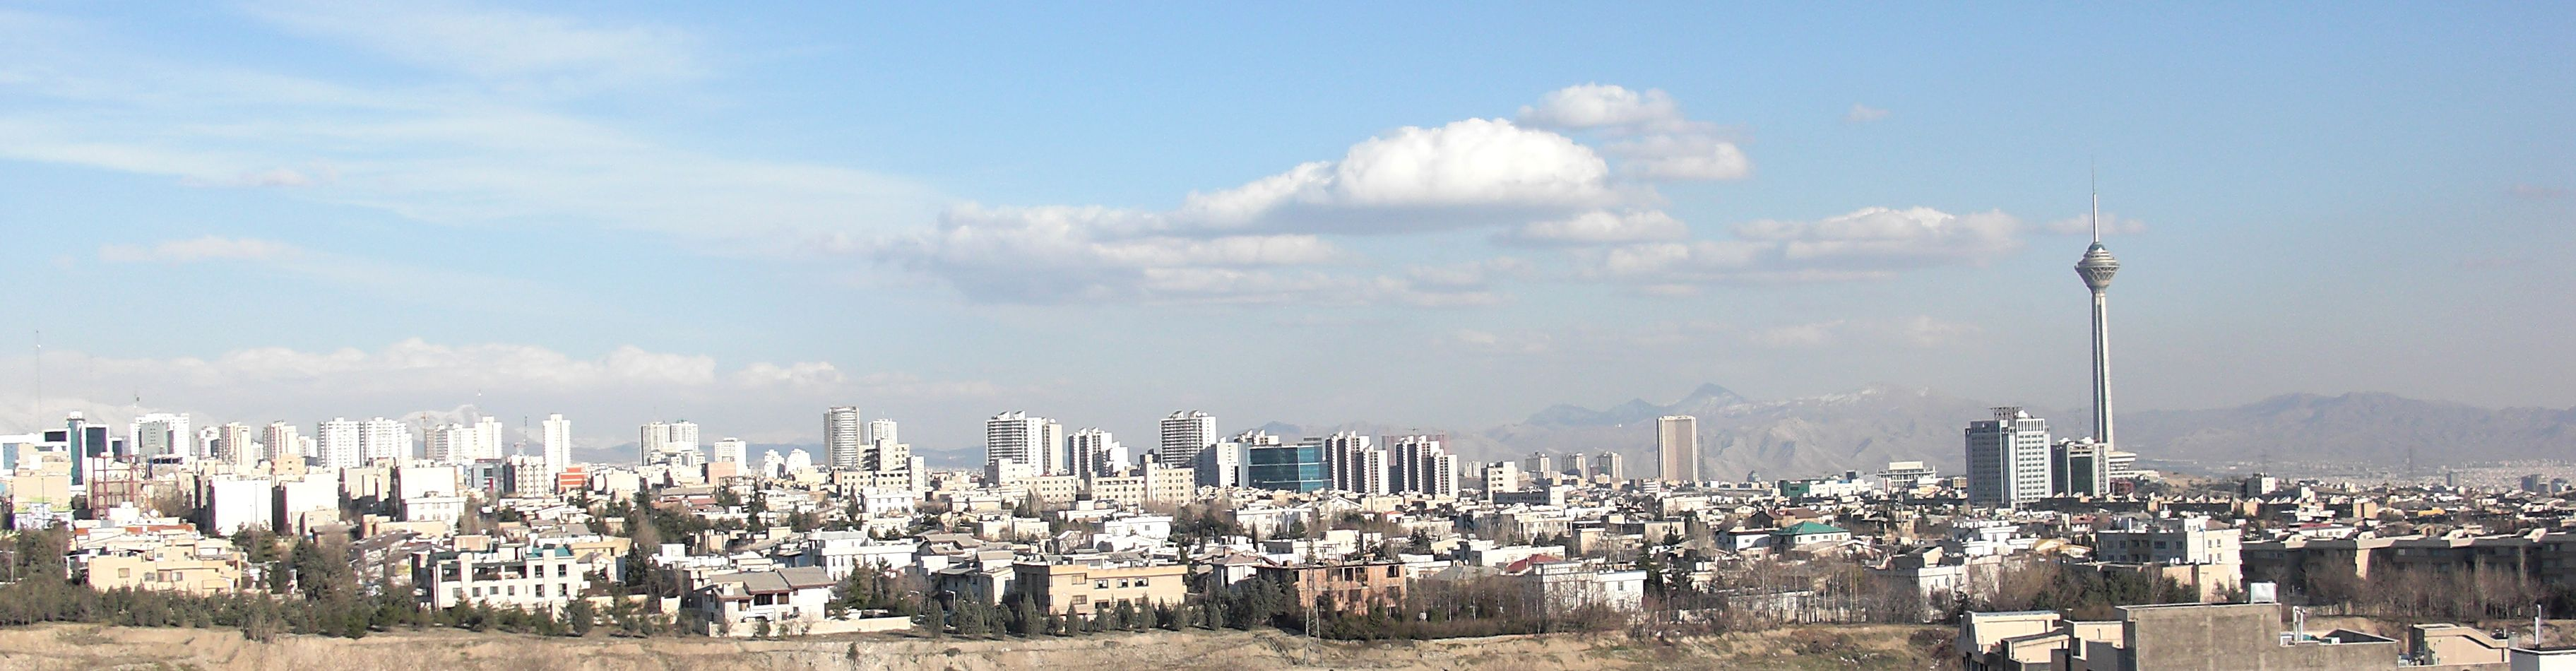 Tehran Office - Find Serviced & Virtual Office Address in Tehran ...